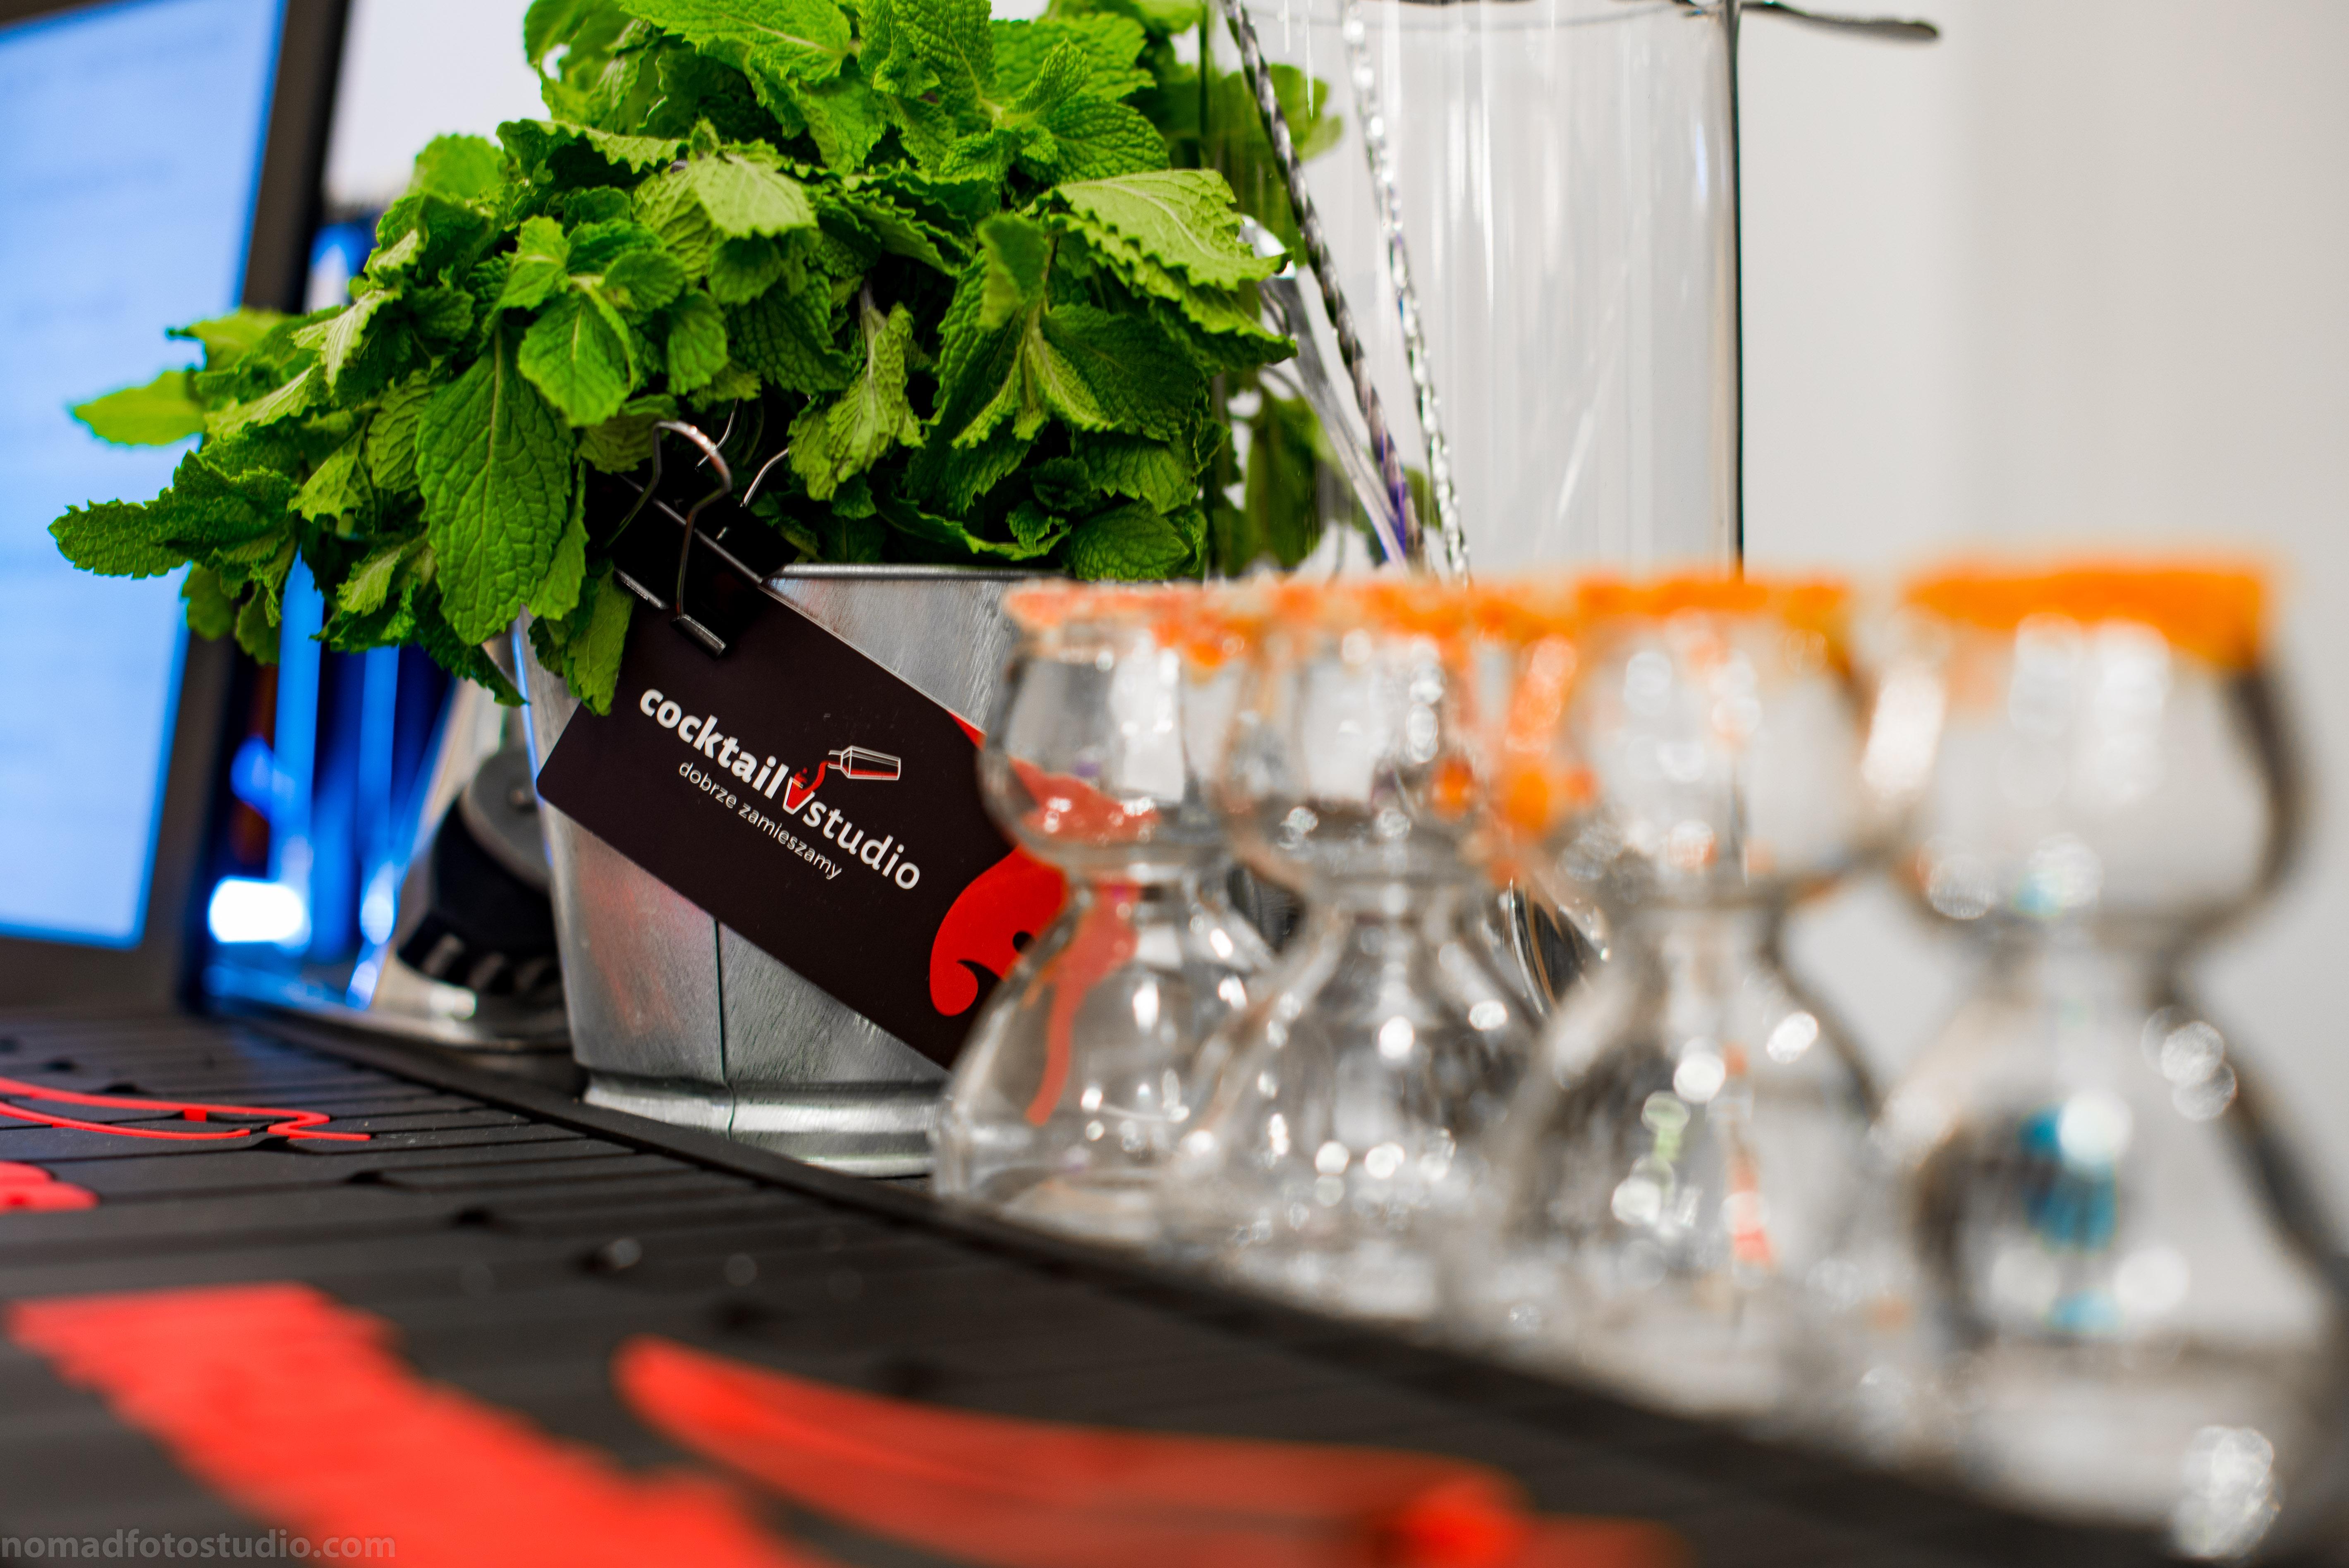 Siedlce-drink-bar-mobilny-barman-na-wesele-evet-agencja-barmańska-drinki-3